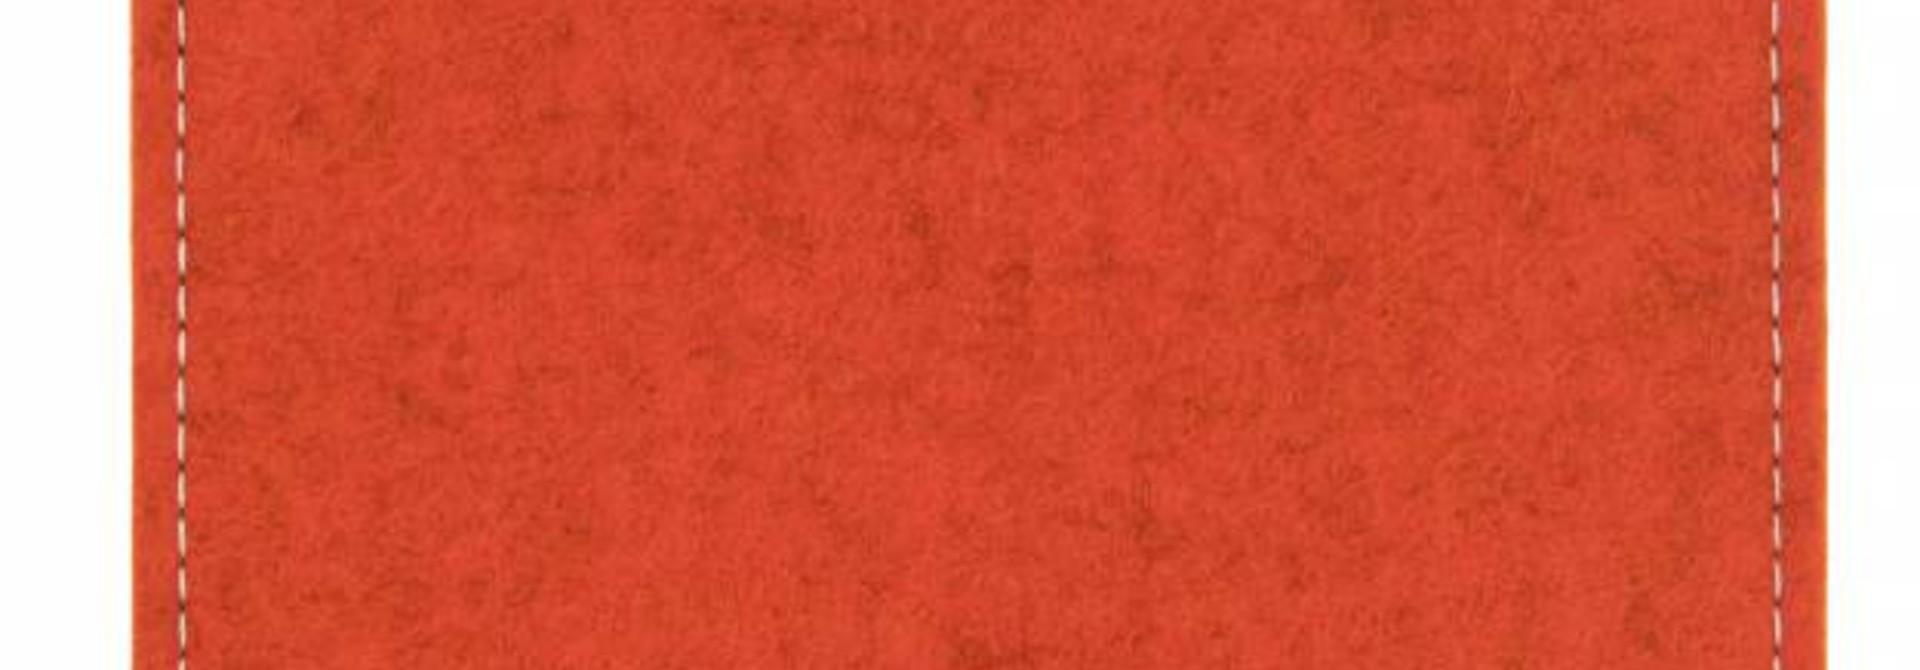 eBook Sleeve Rust